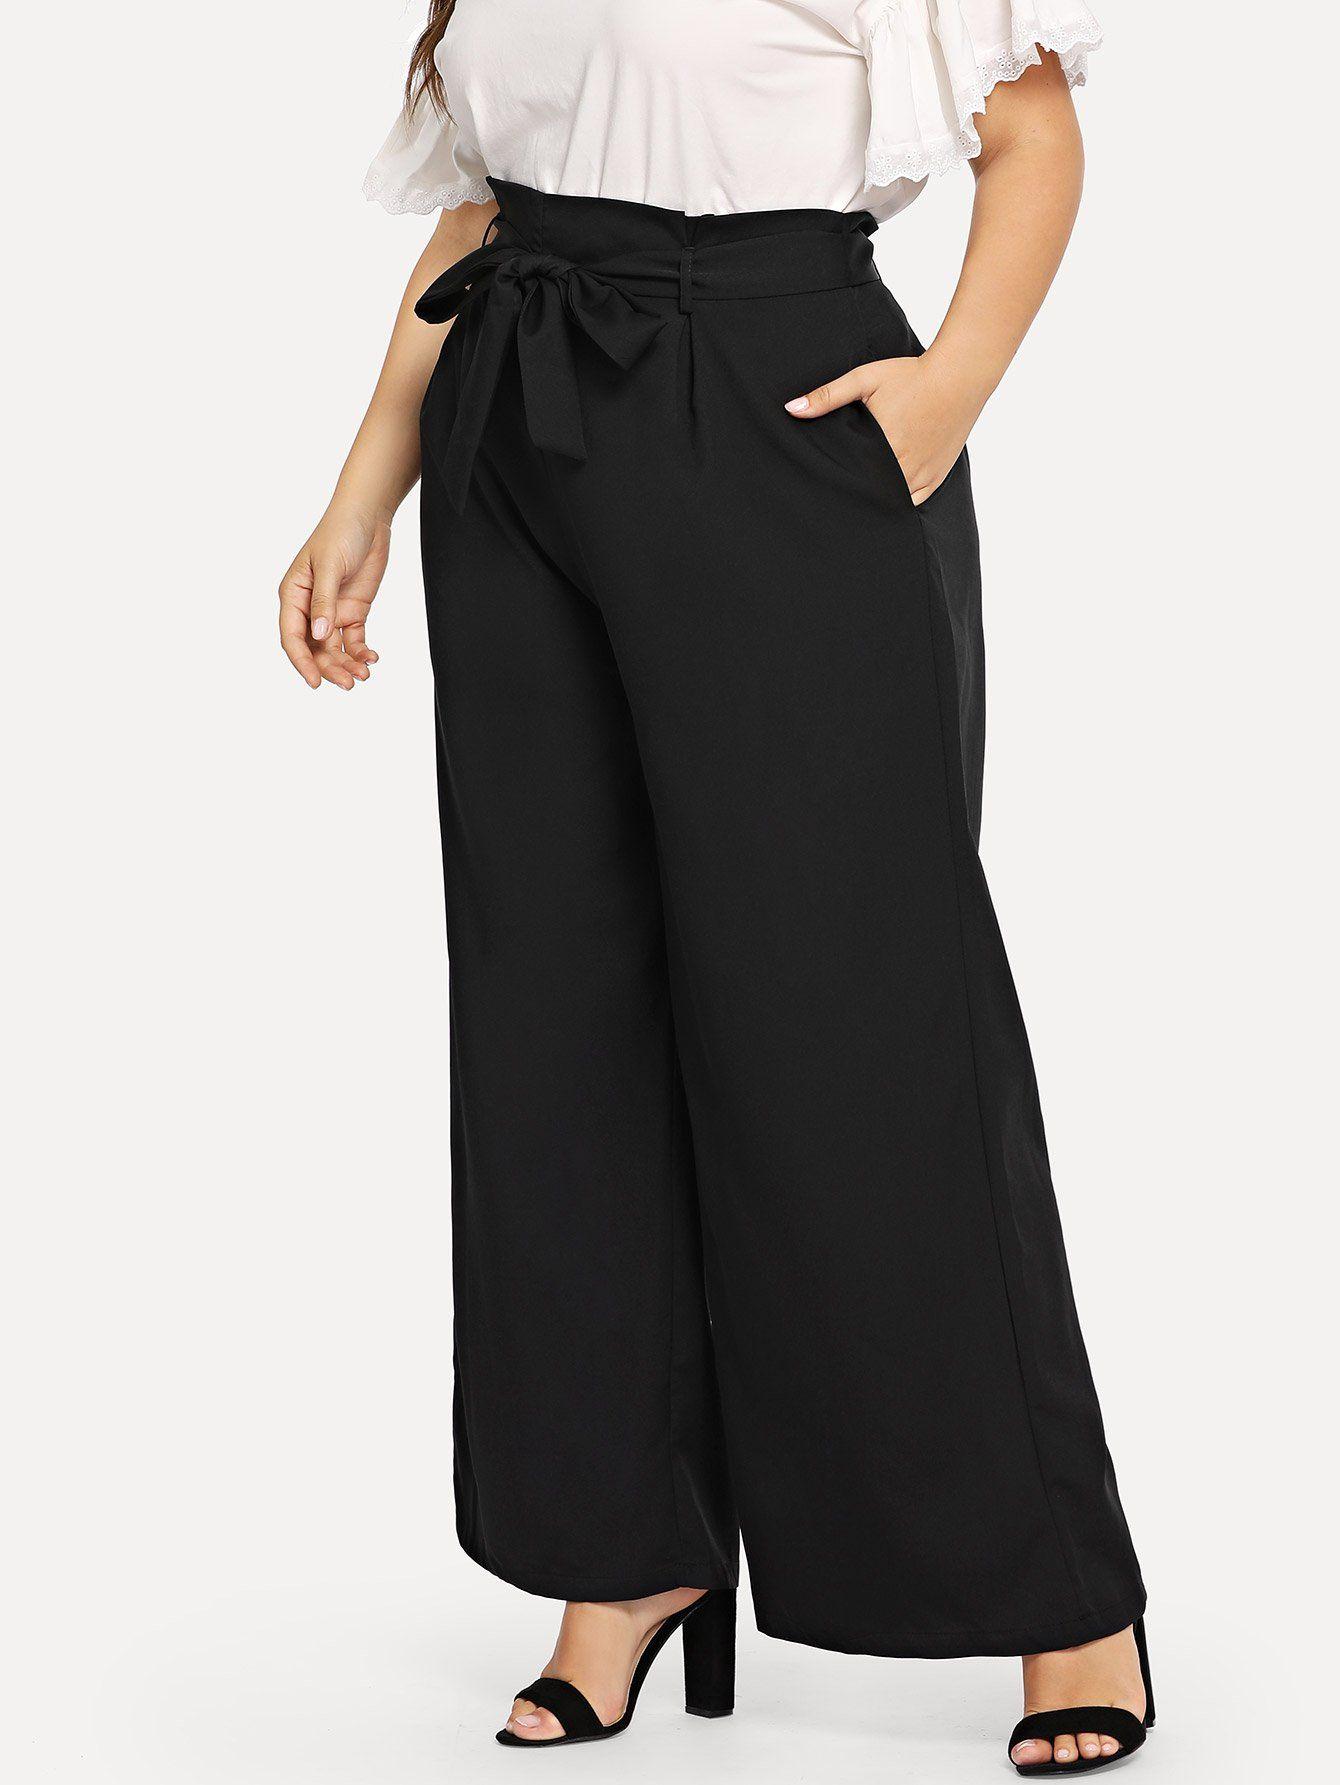 5c60bfd01084 plus waist belted pocket wide leg pants. #fashion #plus size #plus size  pants